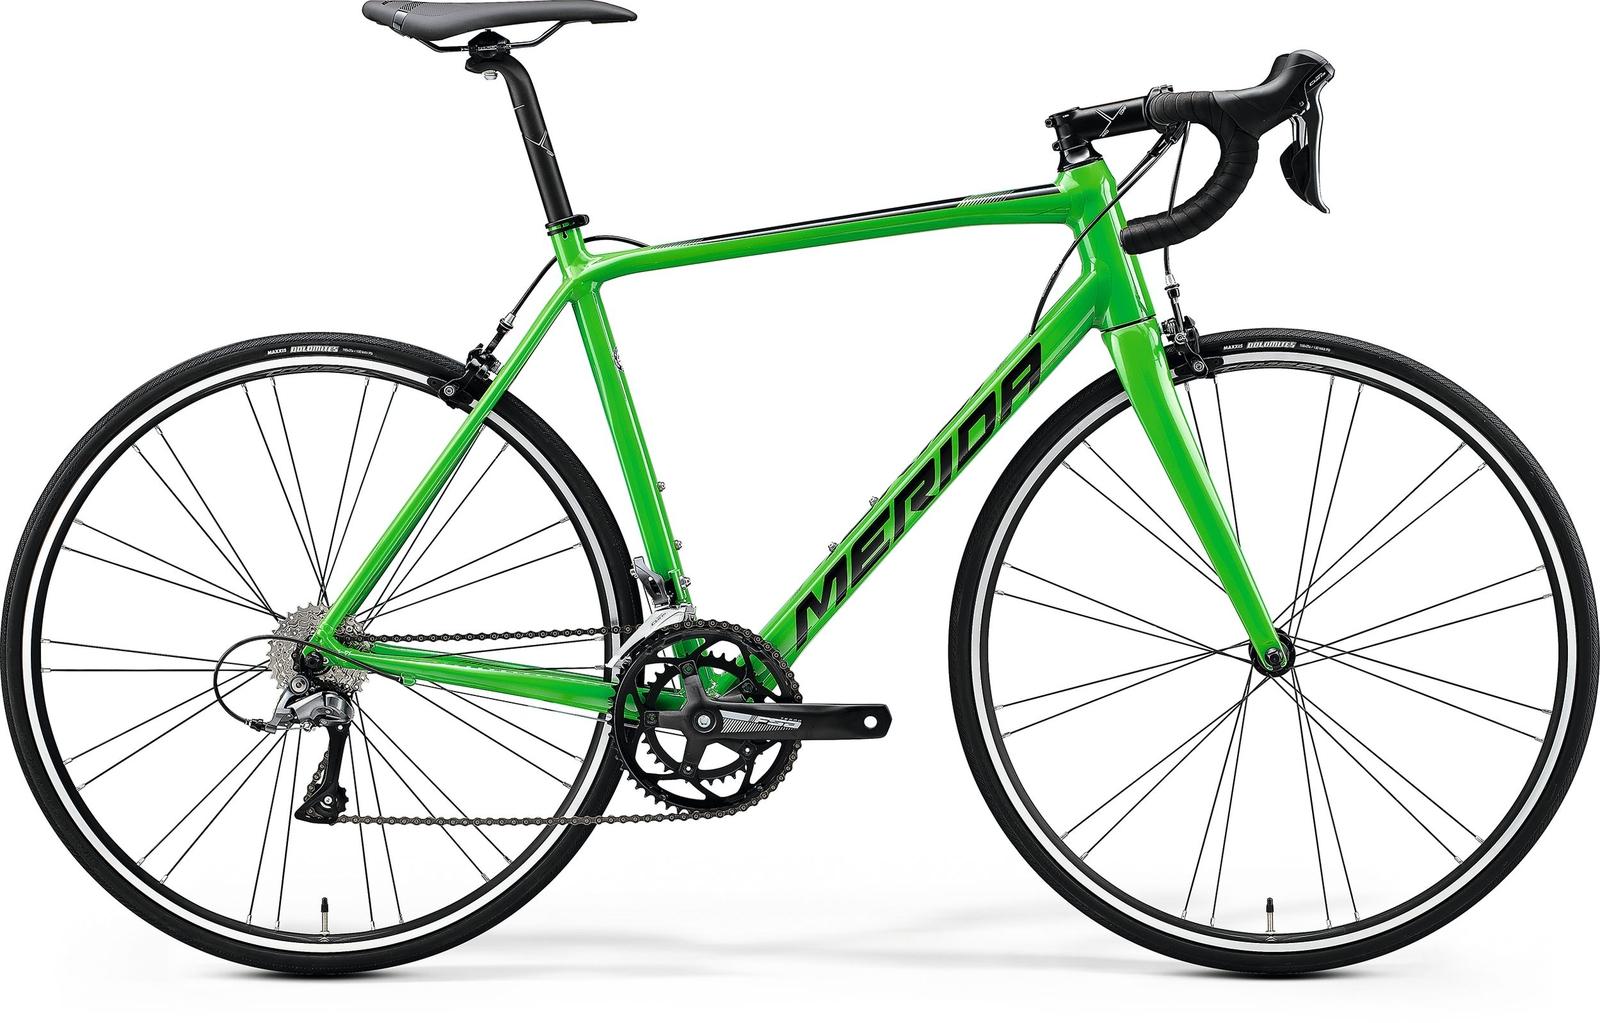 Bicicleta de sosea Merida Scultura 100 Verde/Negru 2020 imagine